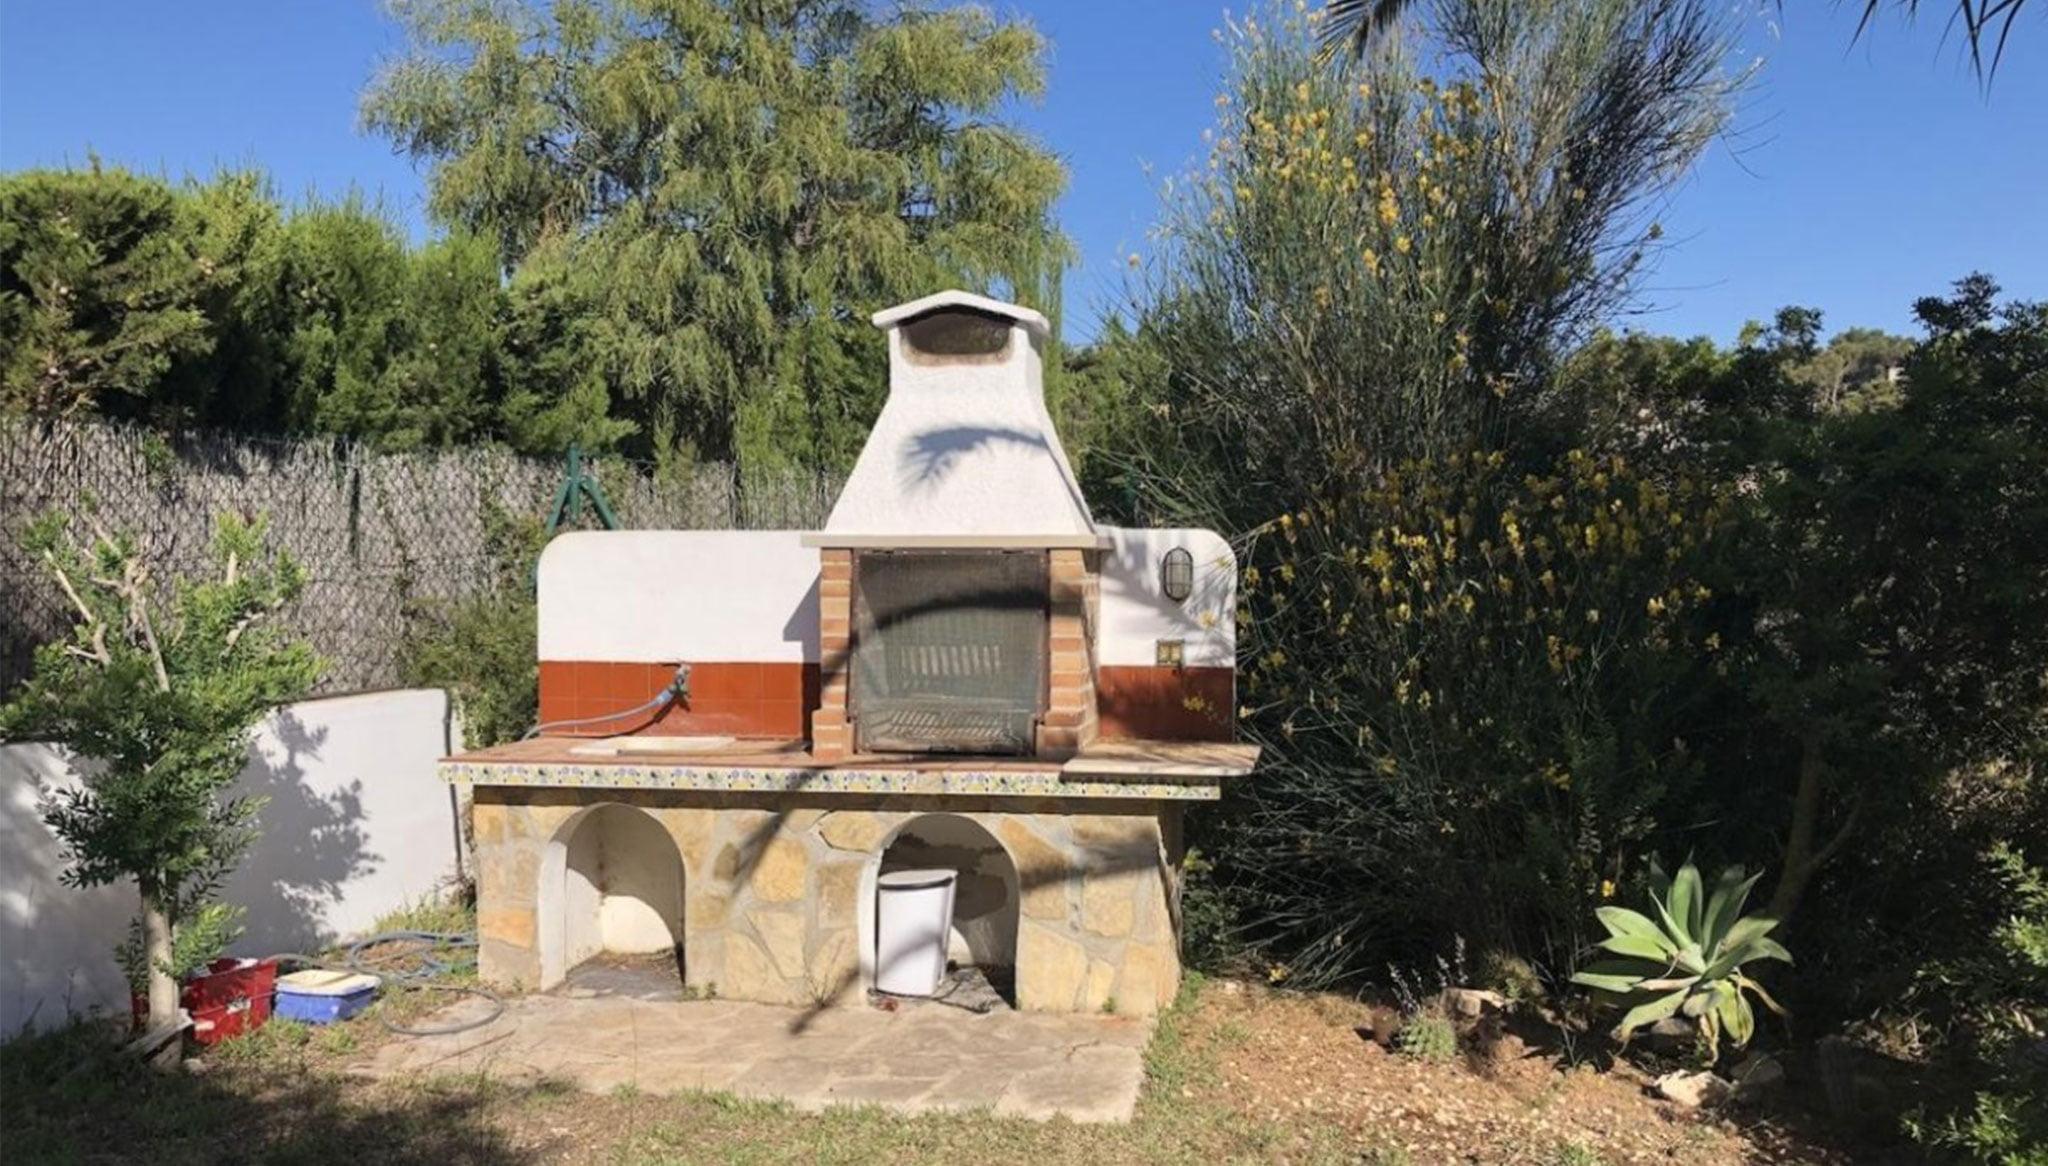 Barbacoa en una vila en venda a Xàbia - Terramar Costa Blanca